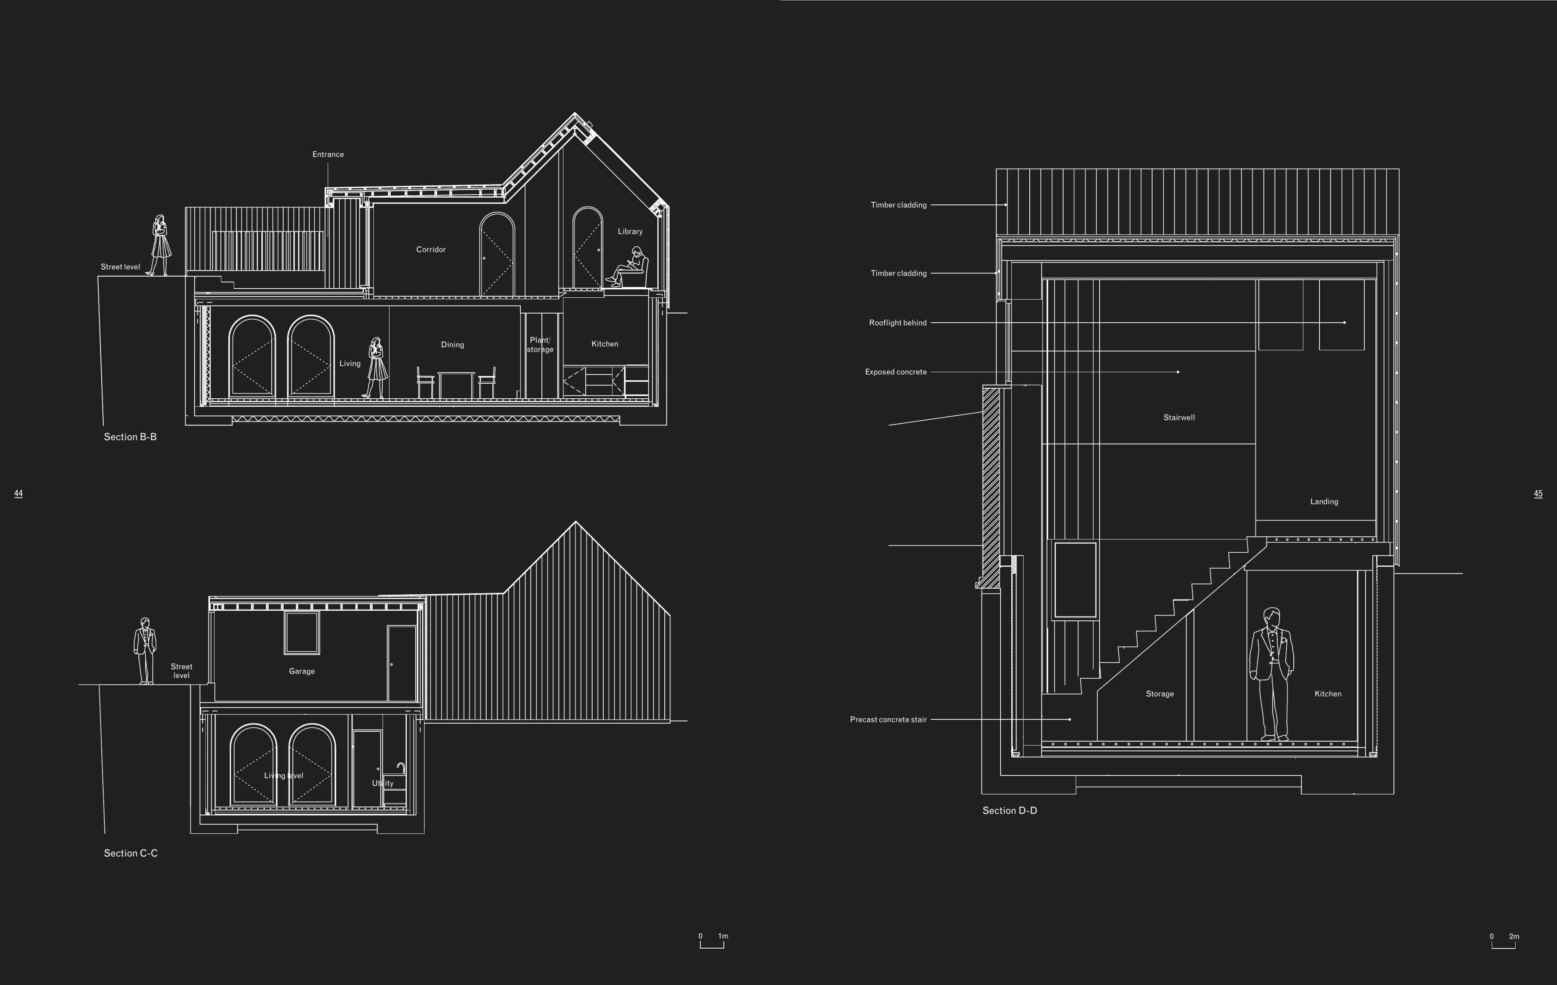 t-sa_Tiverton_Architects Journal_06